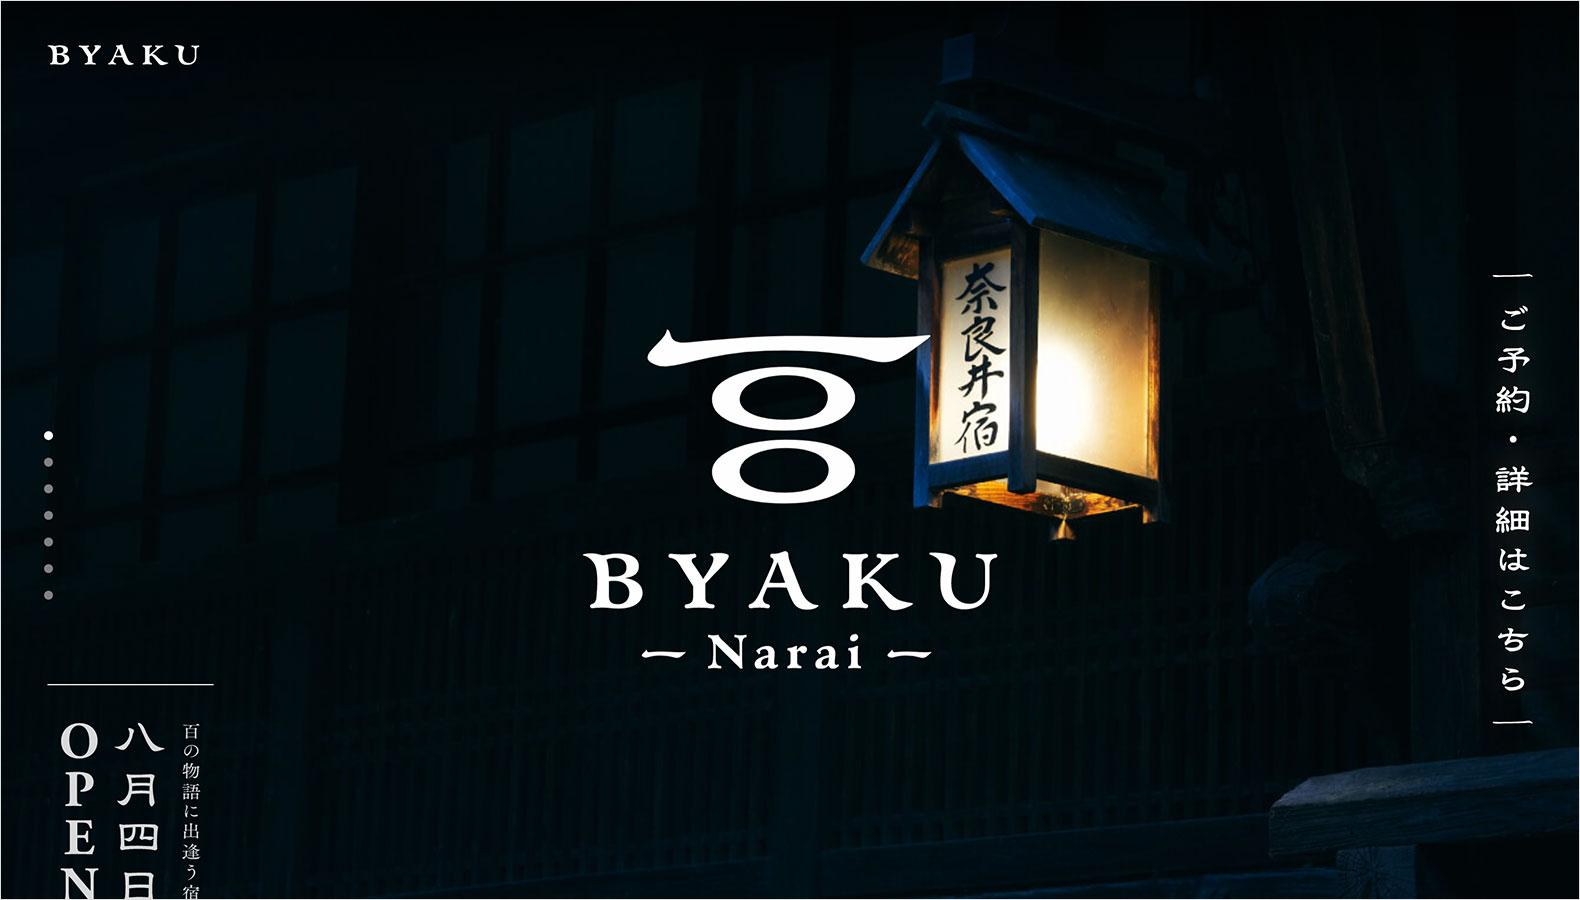 BYAKU Narai